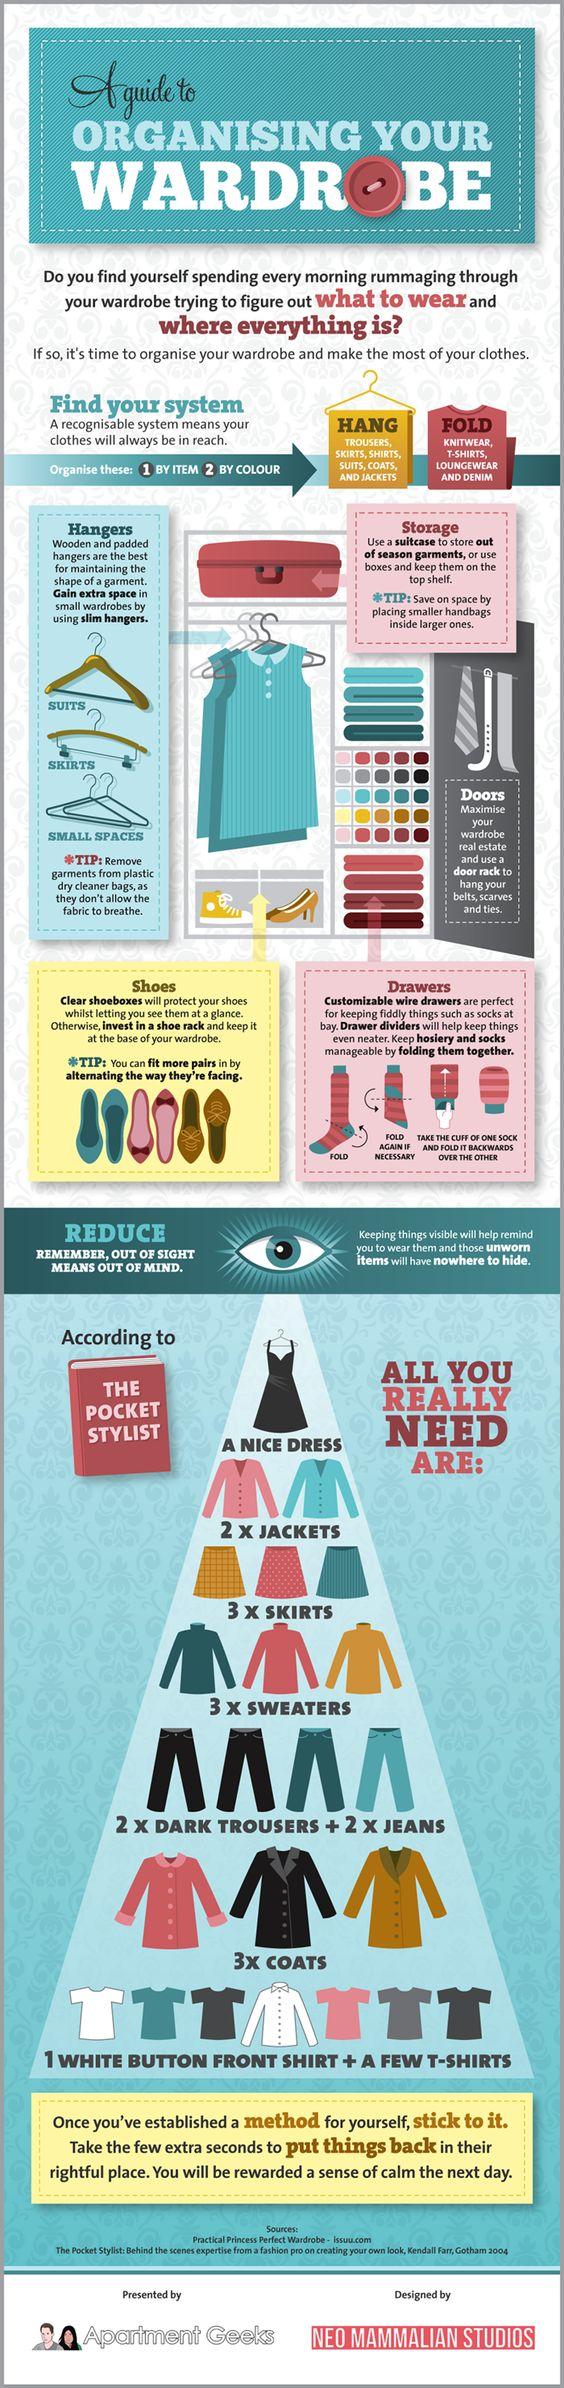 organising-your-wardrobe-final_thumb